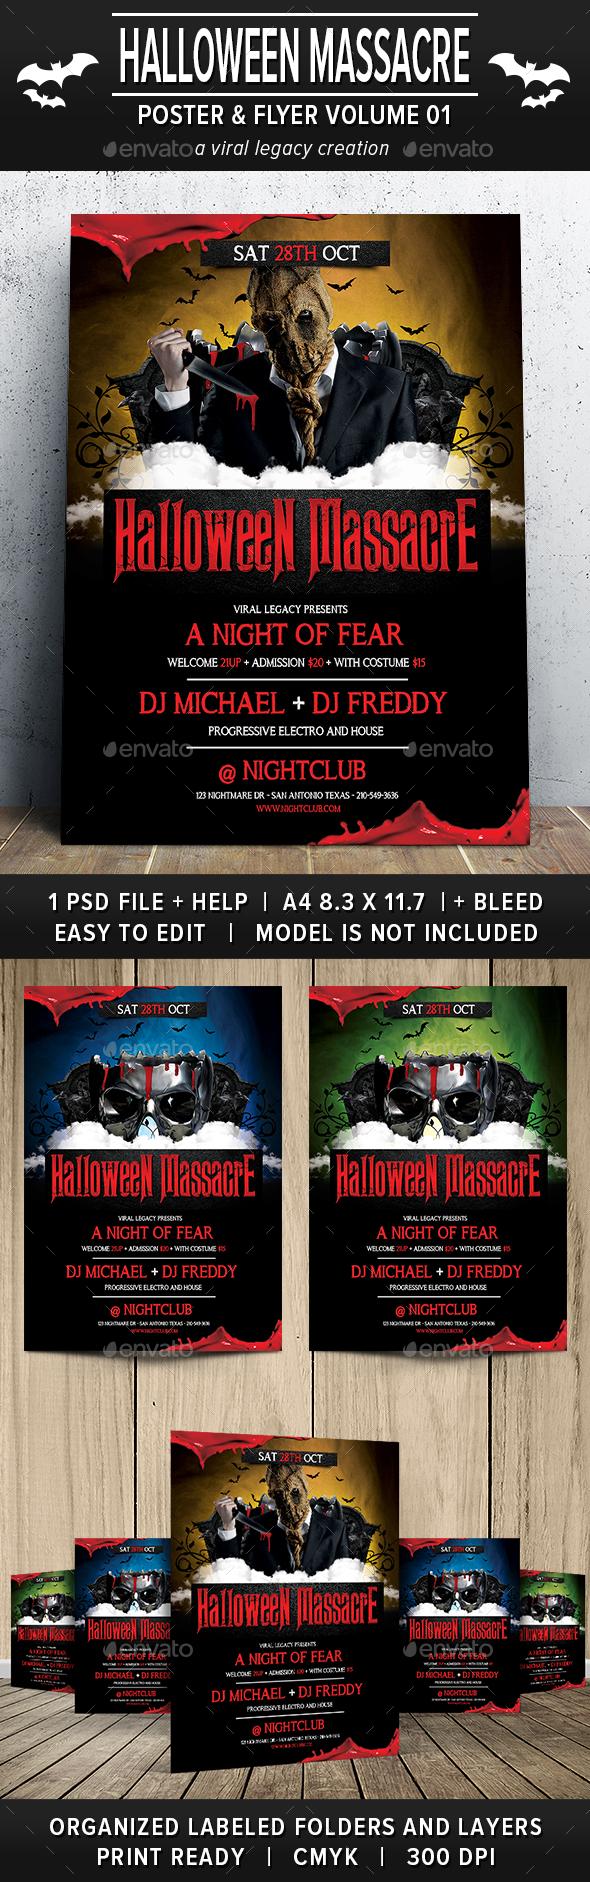 Halloween Massacre Poster / Flyer V01 - Print Templates